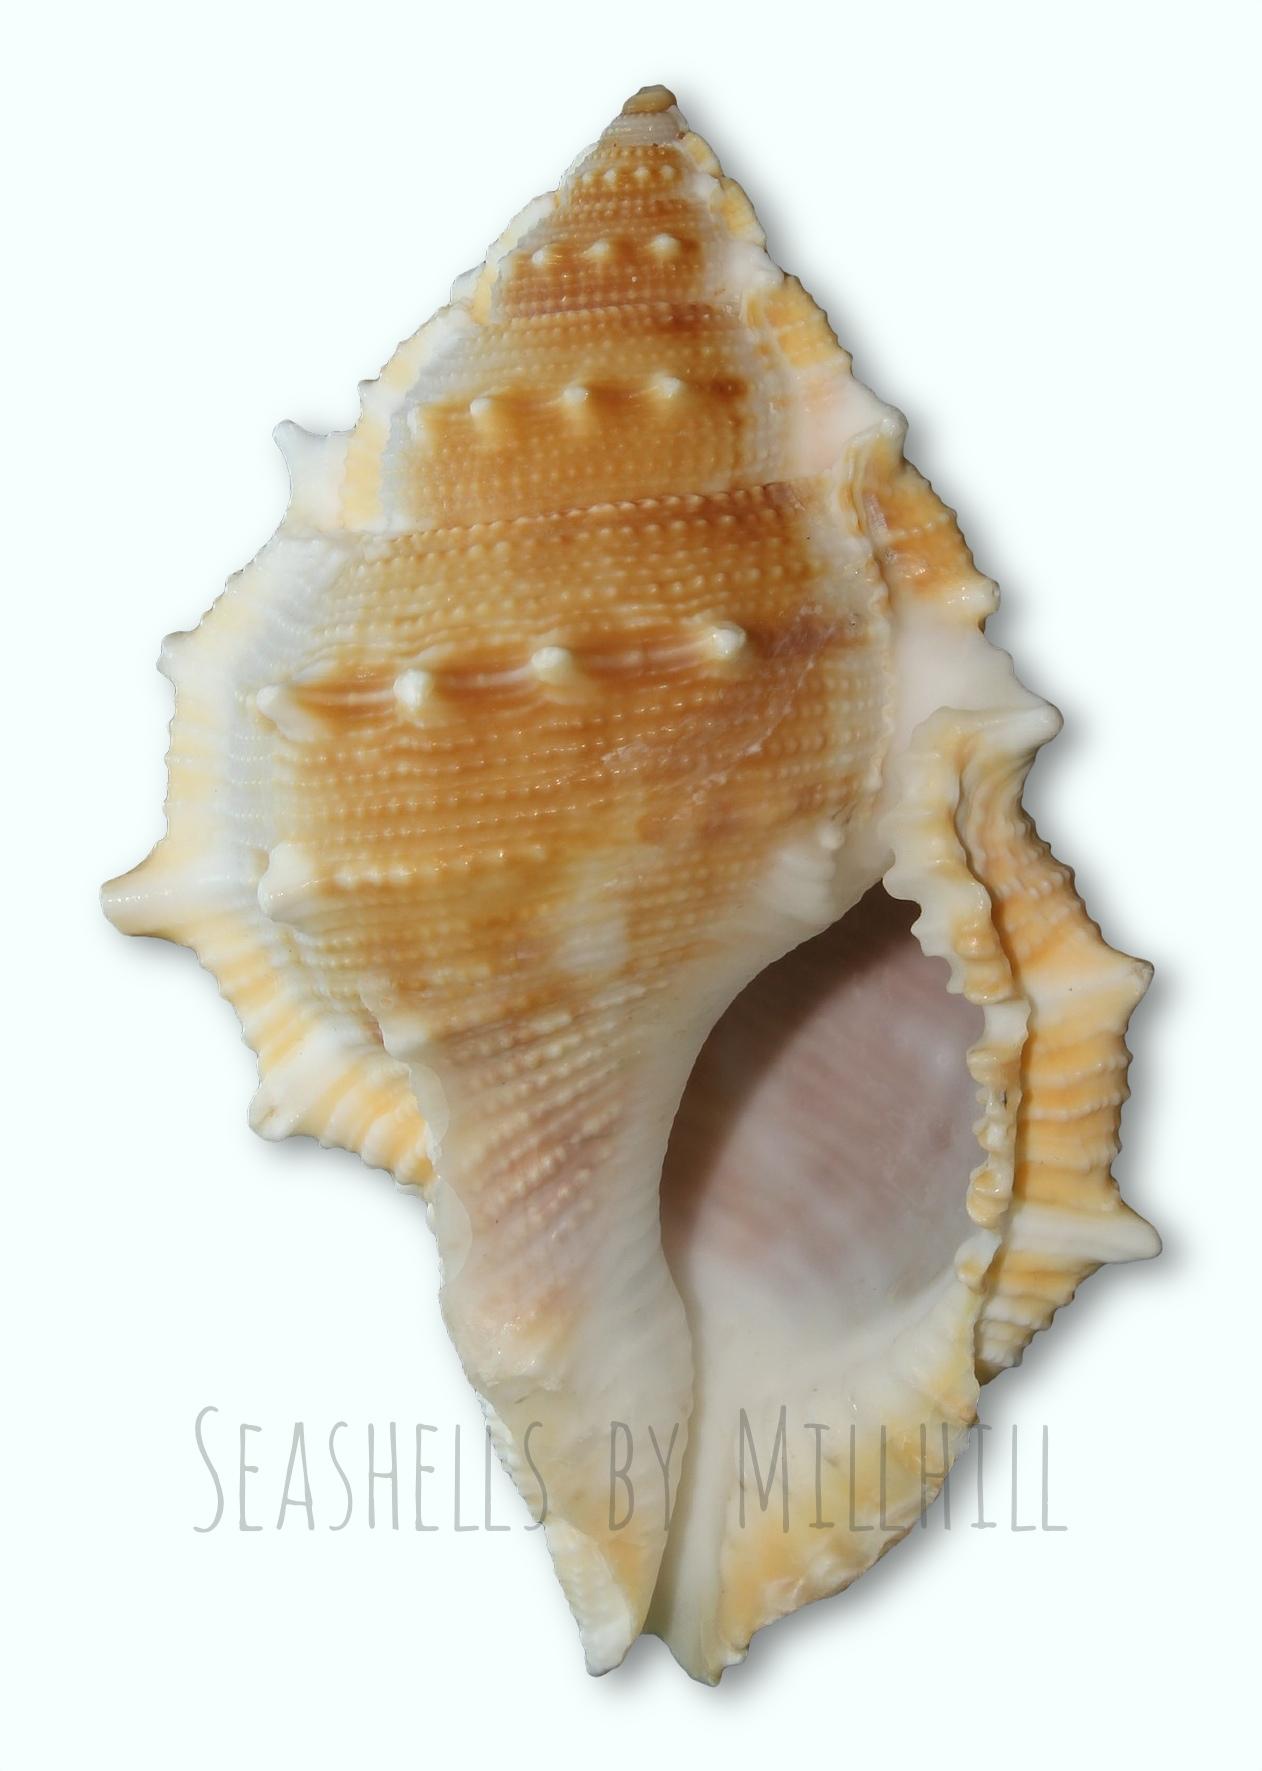 A Pretty Little Seashell Seashells By Millhill